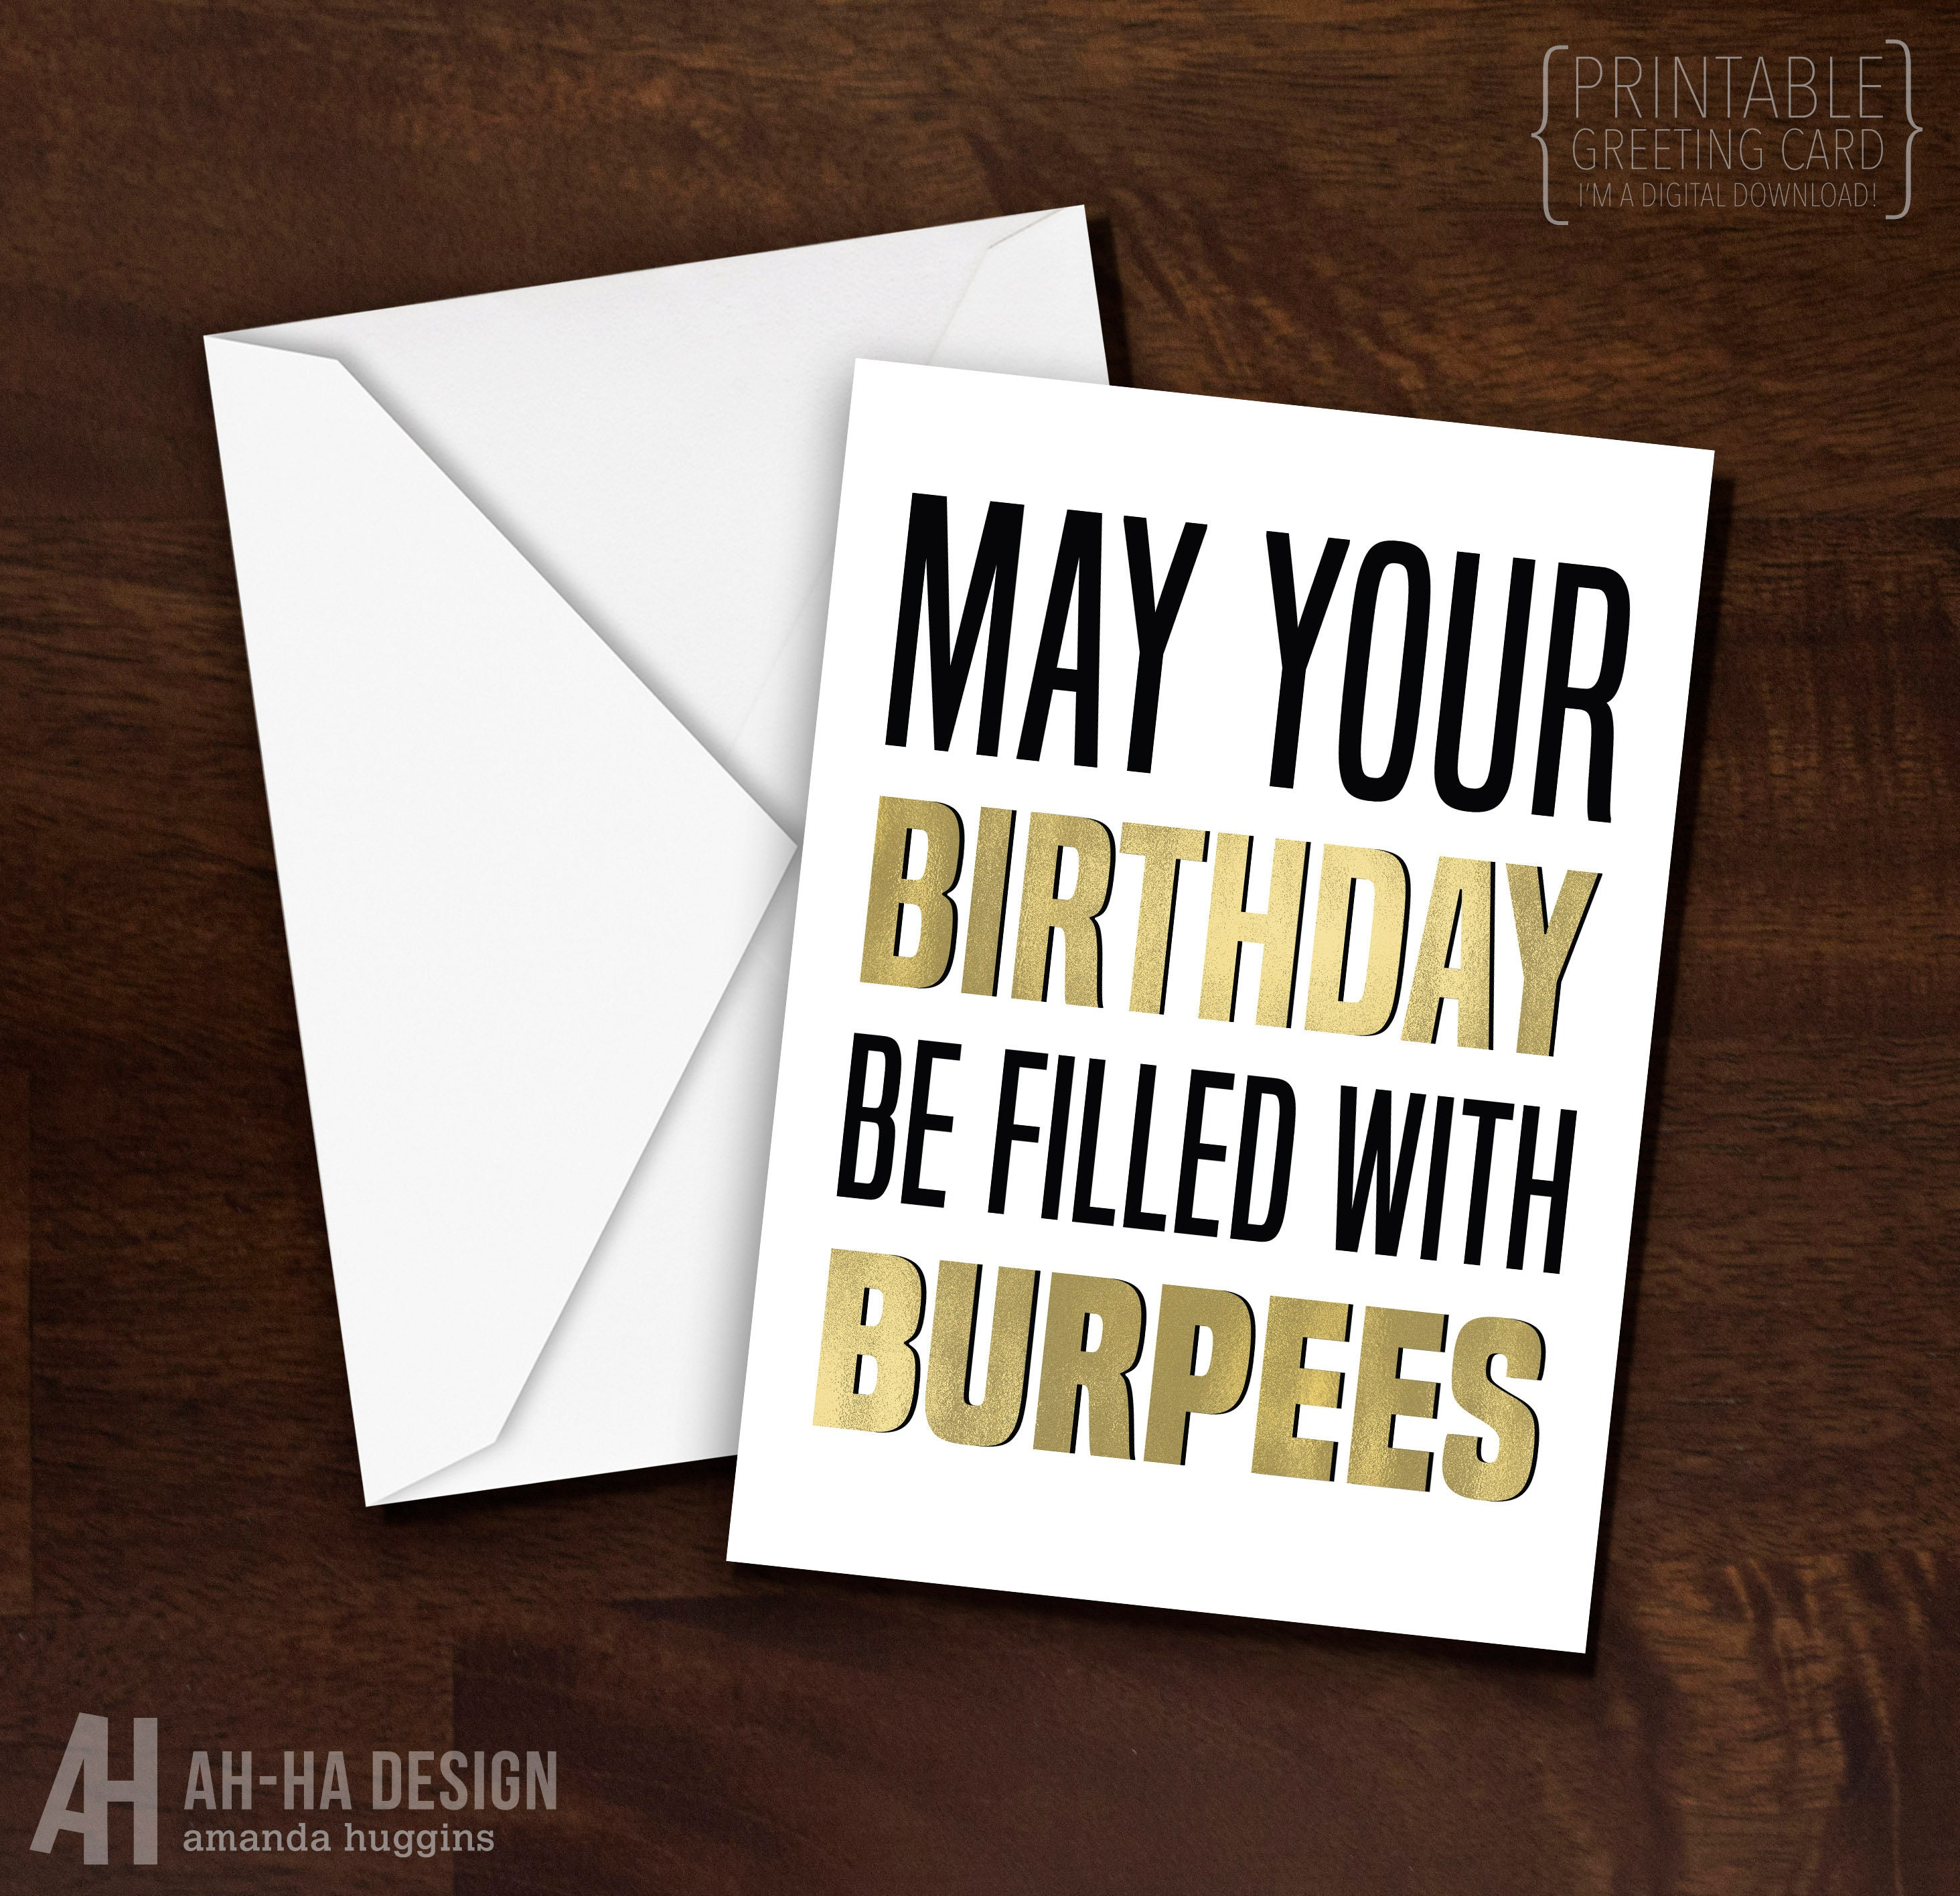 Birthday Burpees Crossfit Printable 5 X 7 Greeting Card